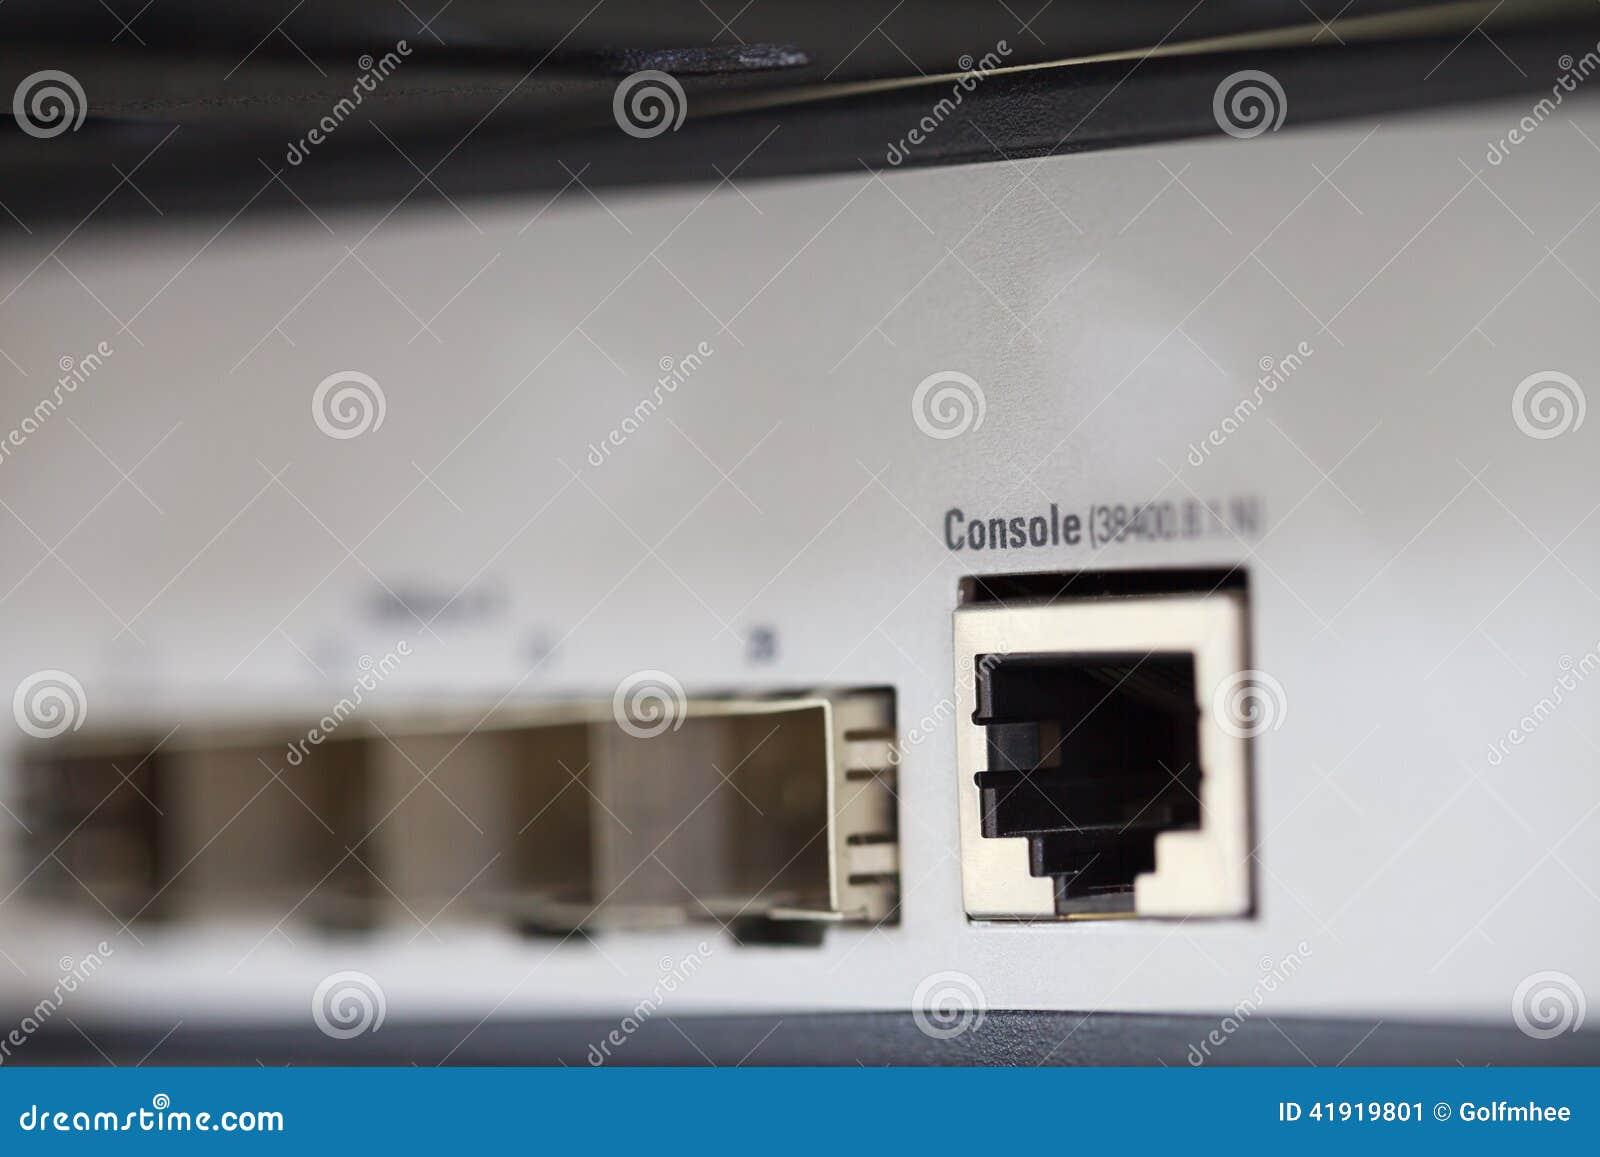 Free Channrl Hub Server Internet